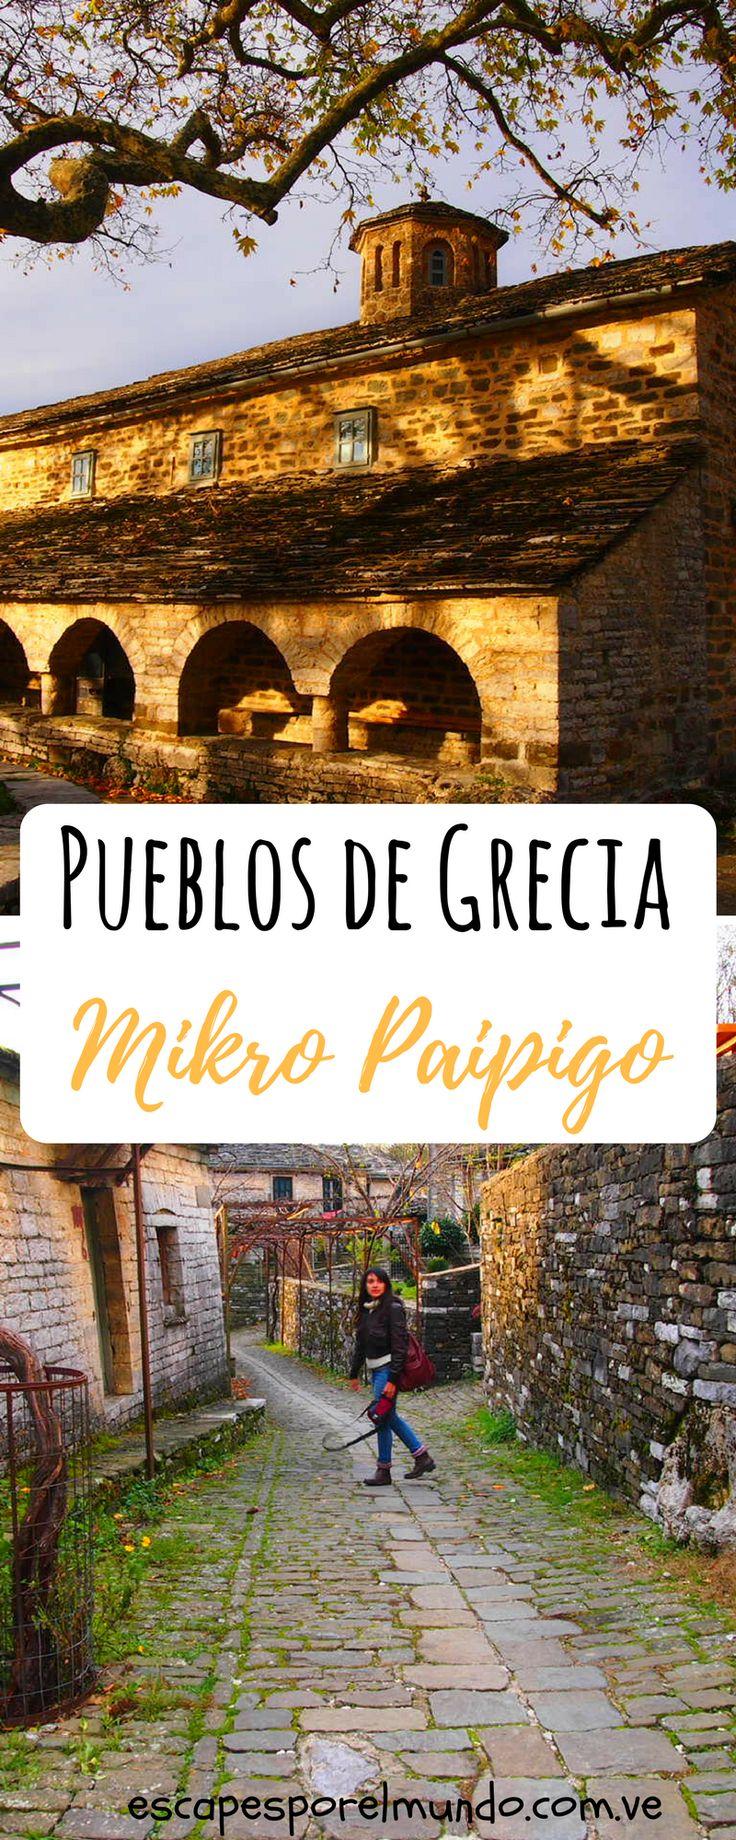 Greece  Europe  Travel   Travel around the world   Wanderlust   Travel destination  Escapes por el Mundo   Viajes  